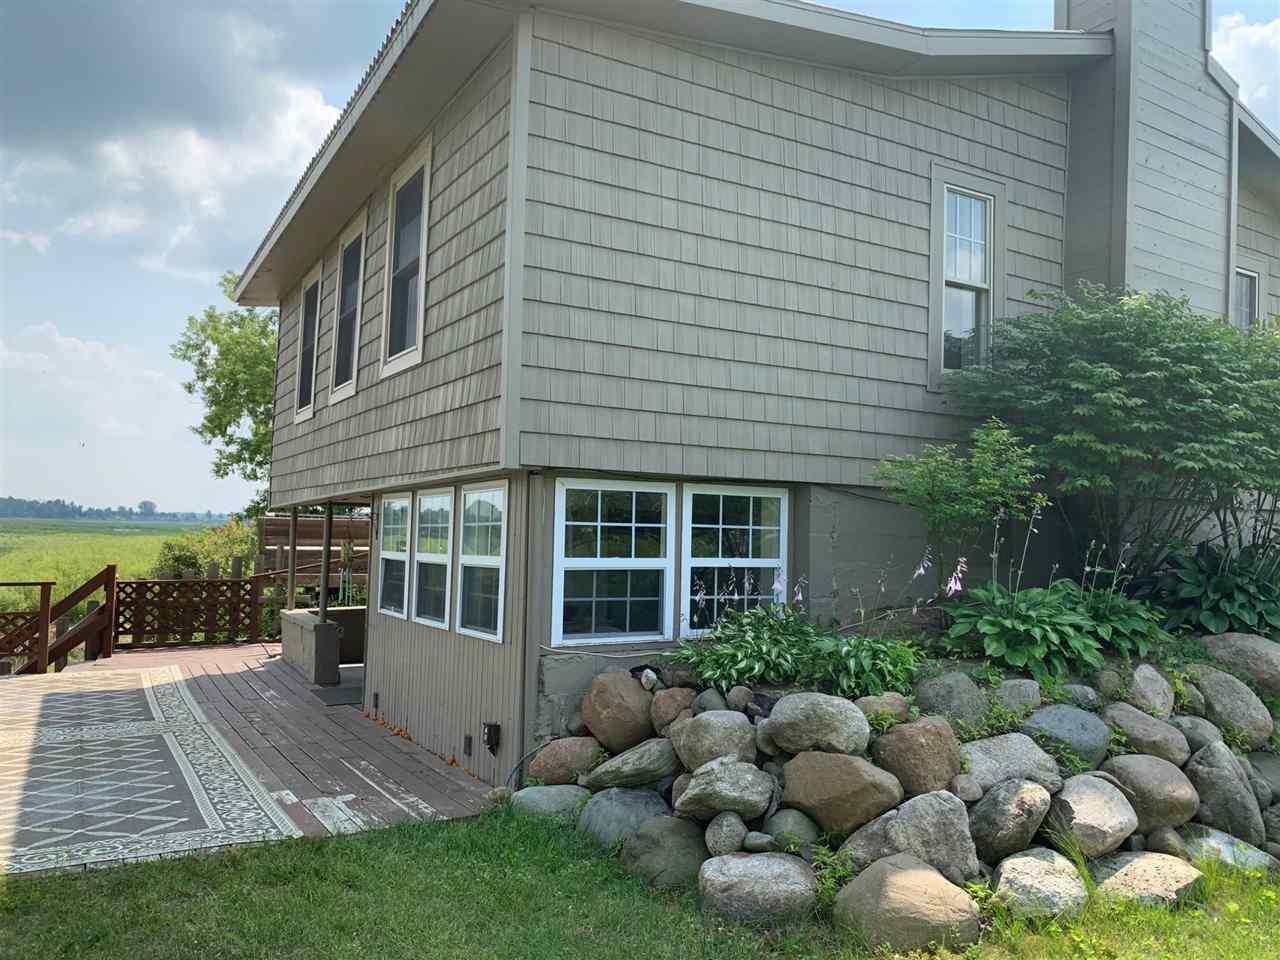 5405 Mangus, Beaverton, MI